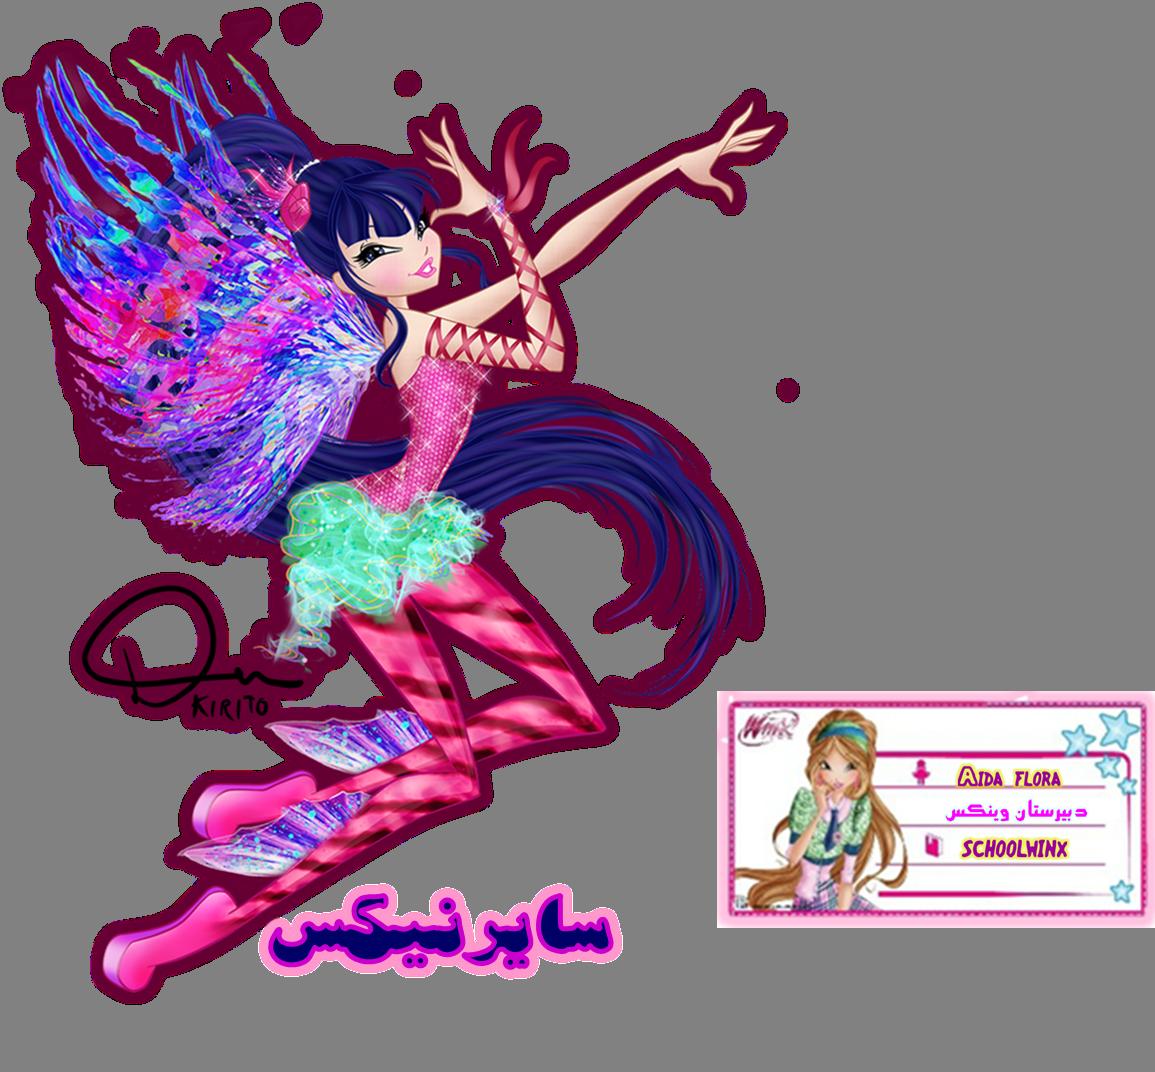 http://s6.picofile.com/file/8214964976/musa_sirenix_by_dukirito_by_dukirito_d7ubj11.png